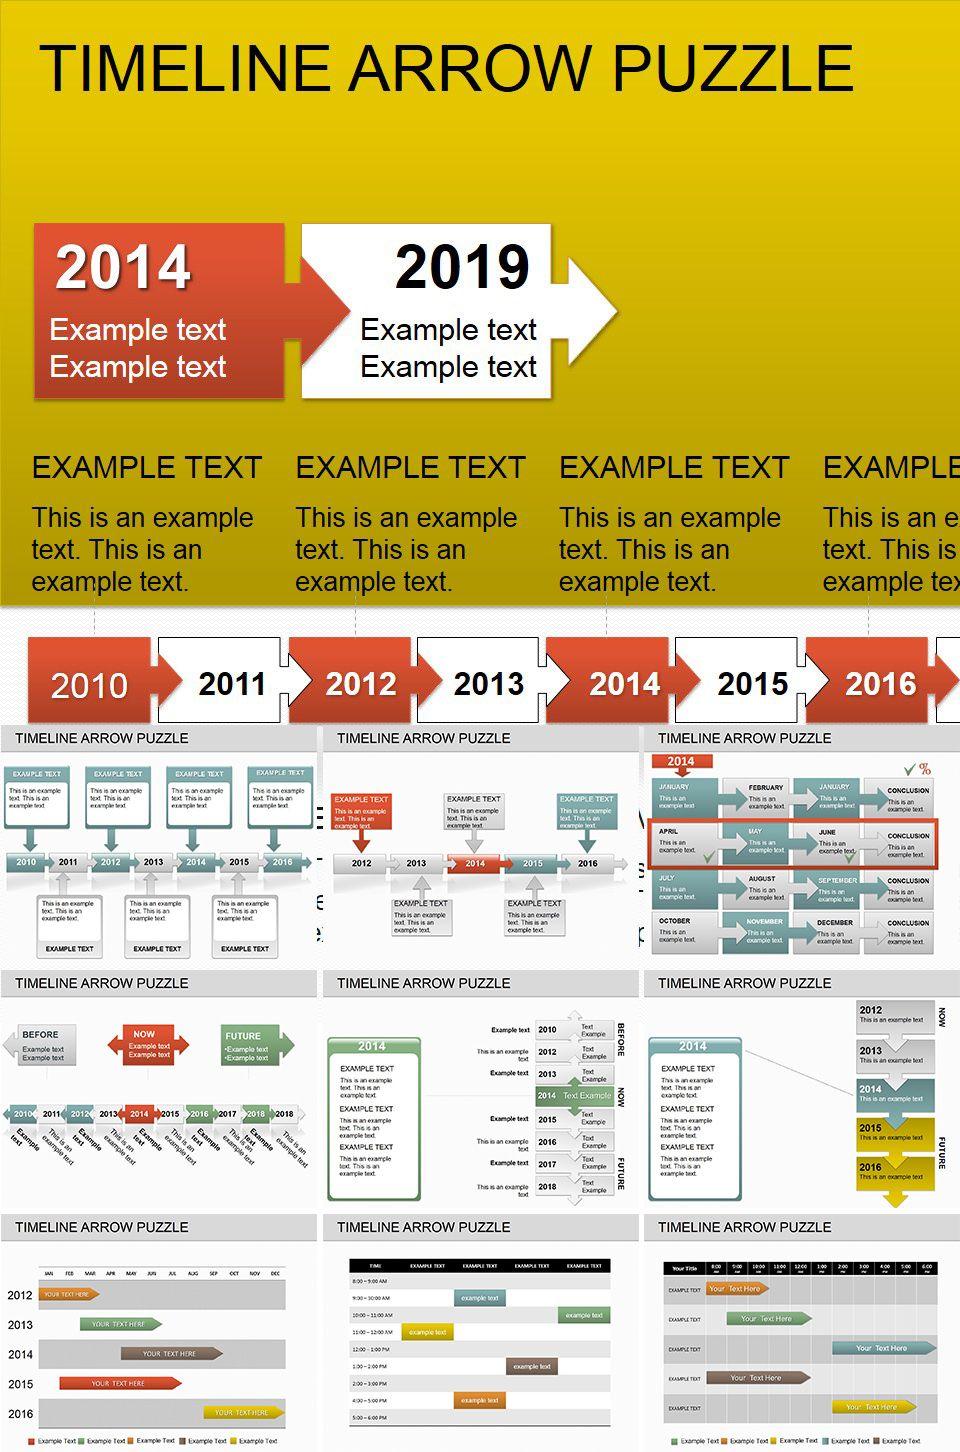 Download timeline arrow puzzle powerpoint diagrams powerpoint download timeline arrow puzzle powerpoint diagrams toneelgroepblik Gallery